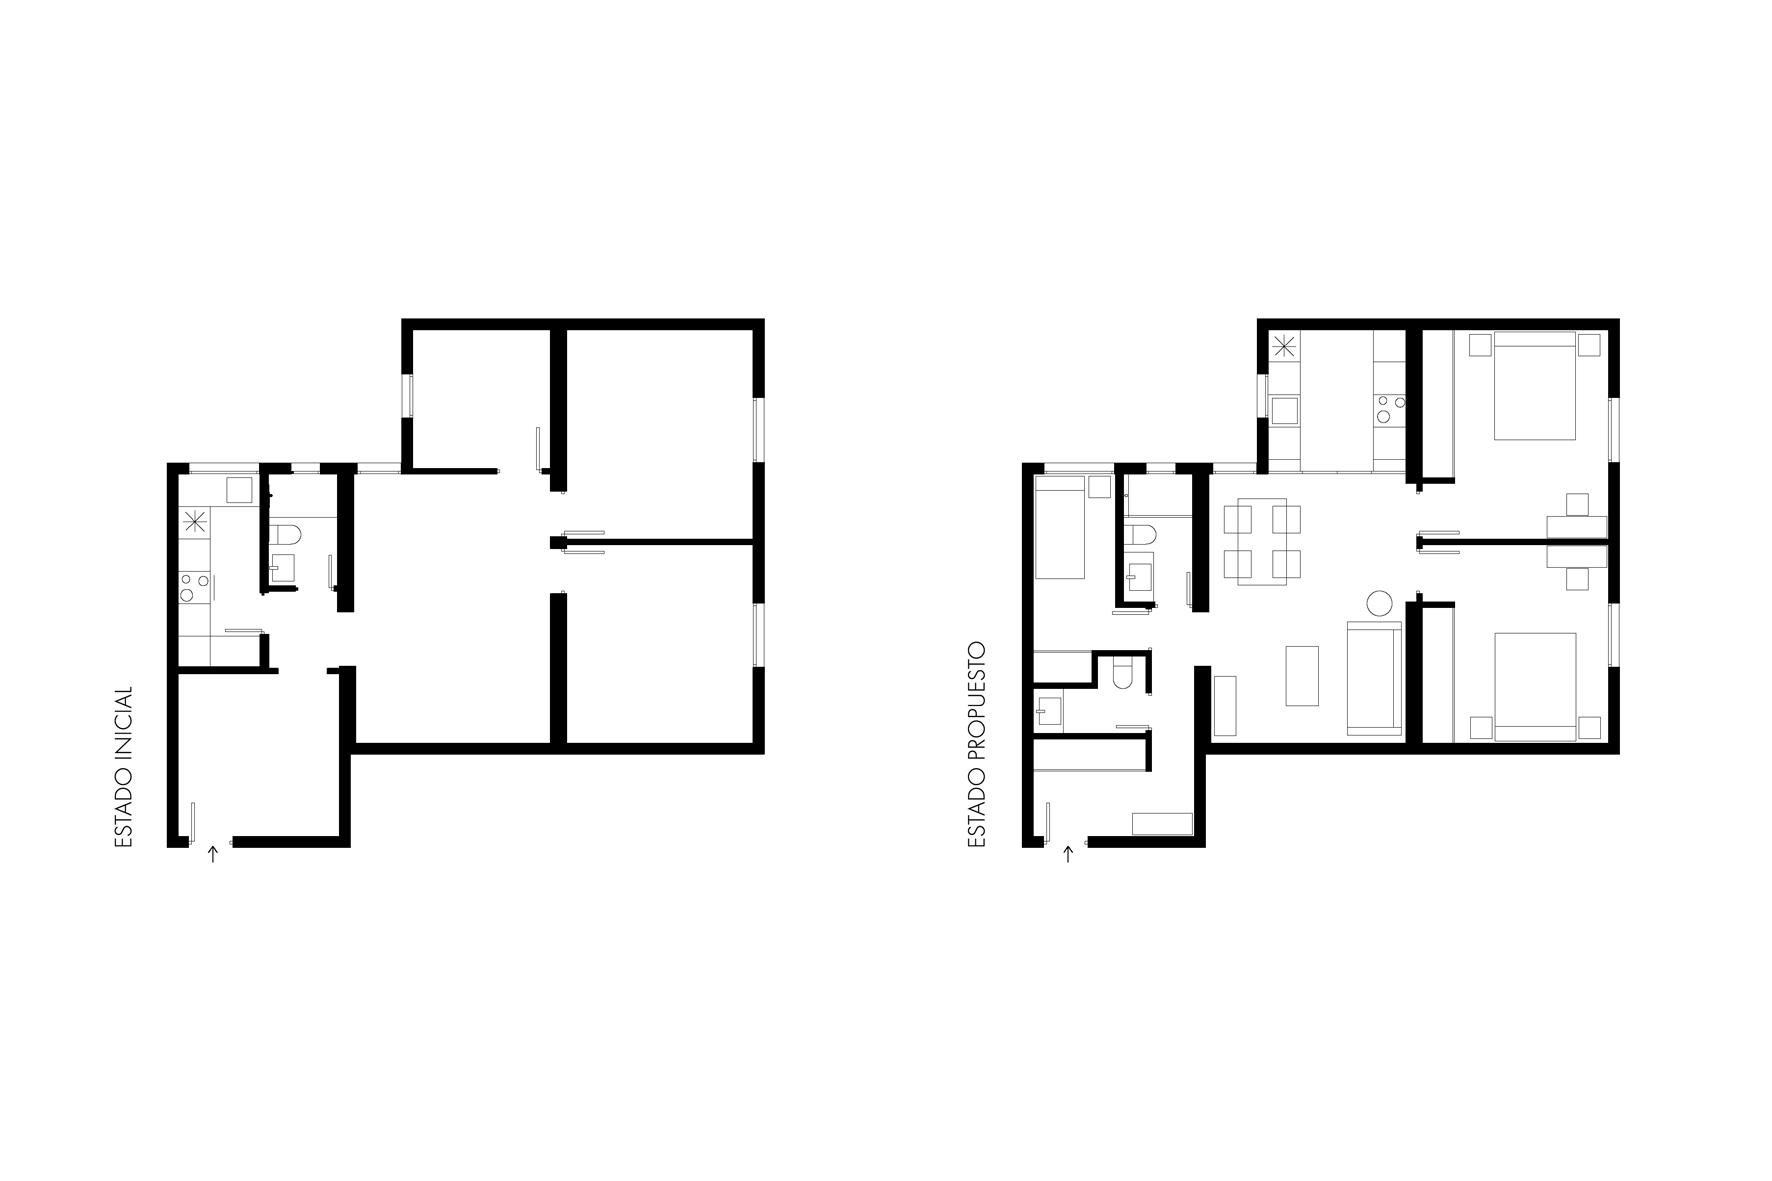 Reforma piso madrid chamartín arquitectura interiores studiobmk (5)